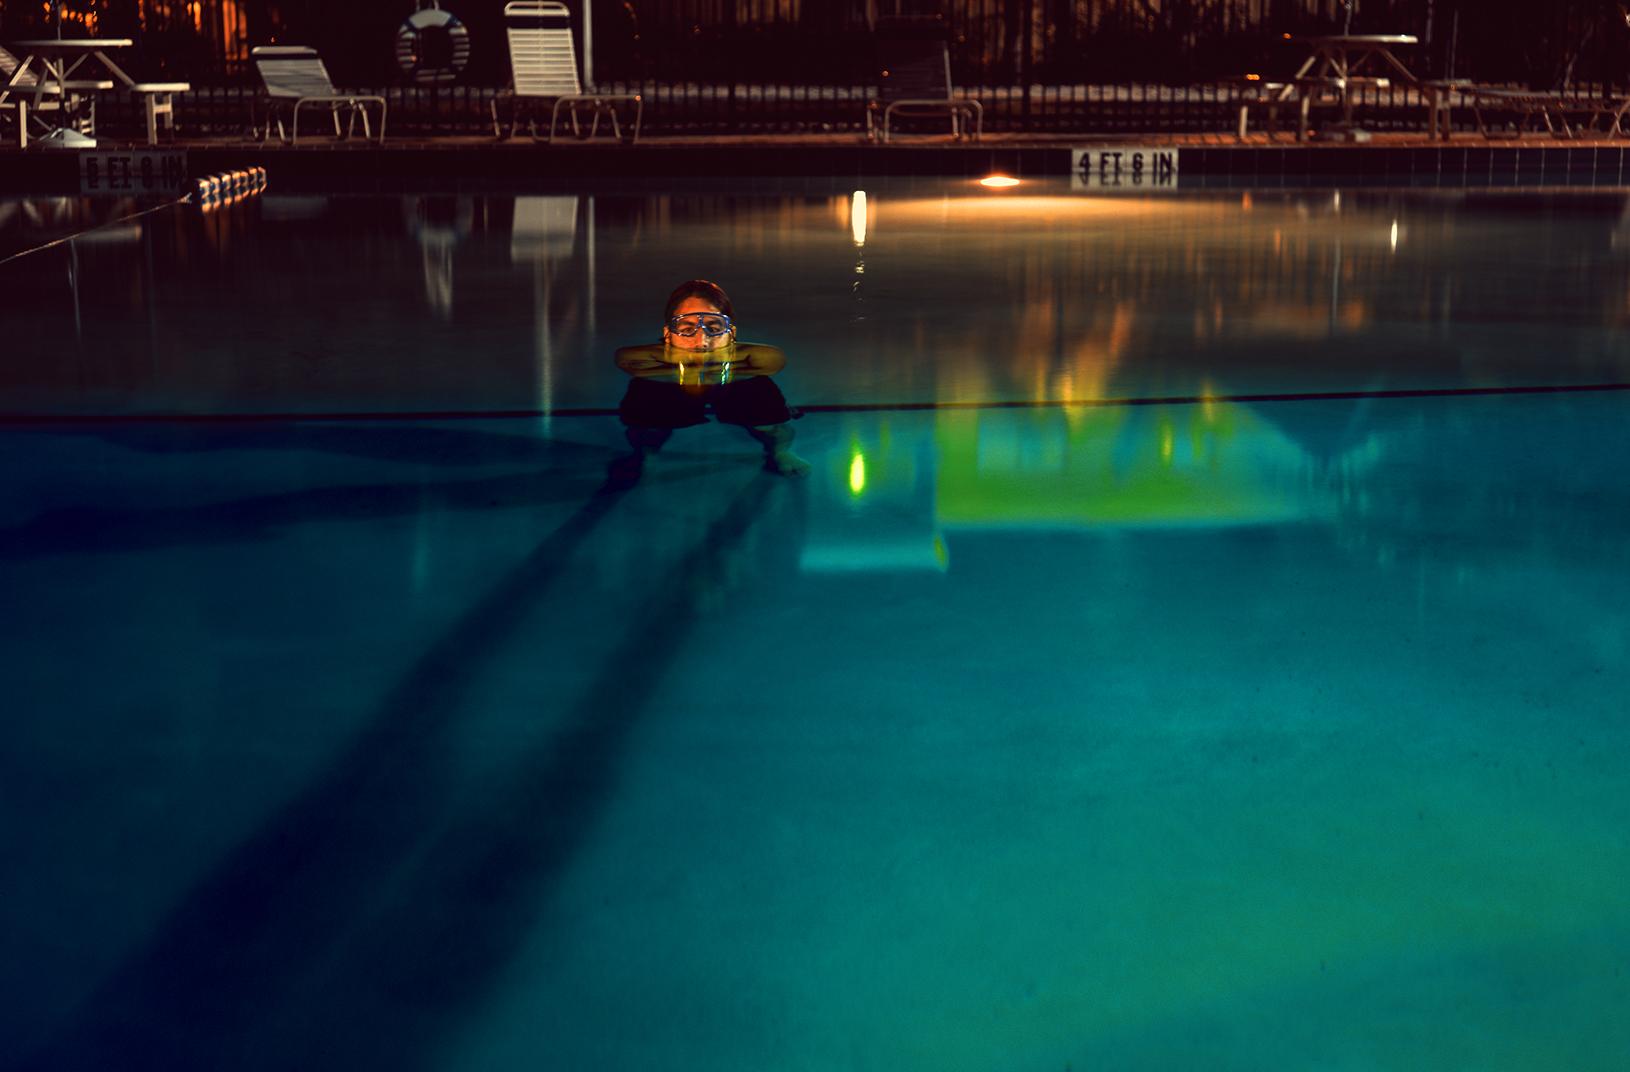 4x5_dreams_Pool2_P_07.jpg